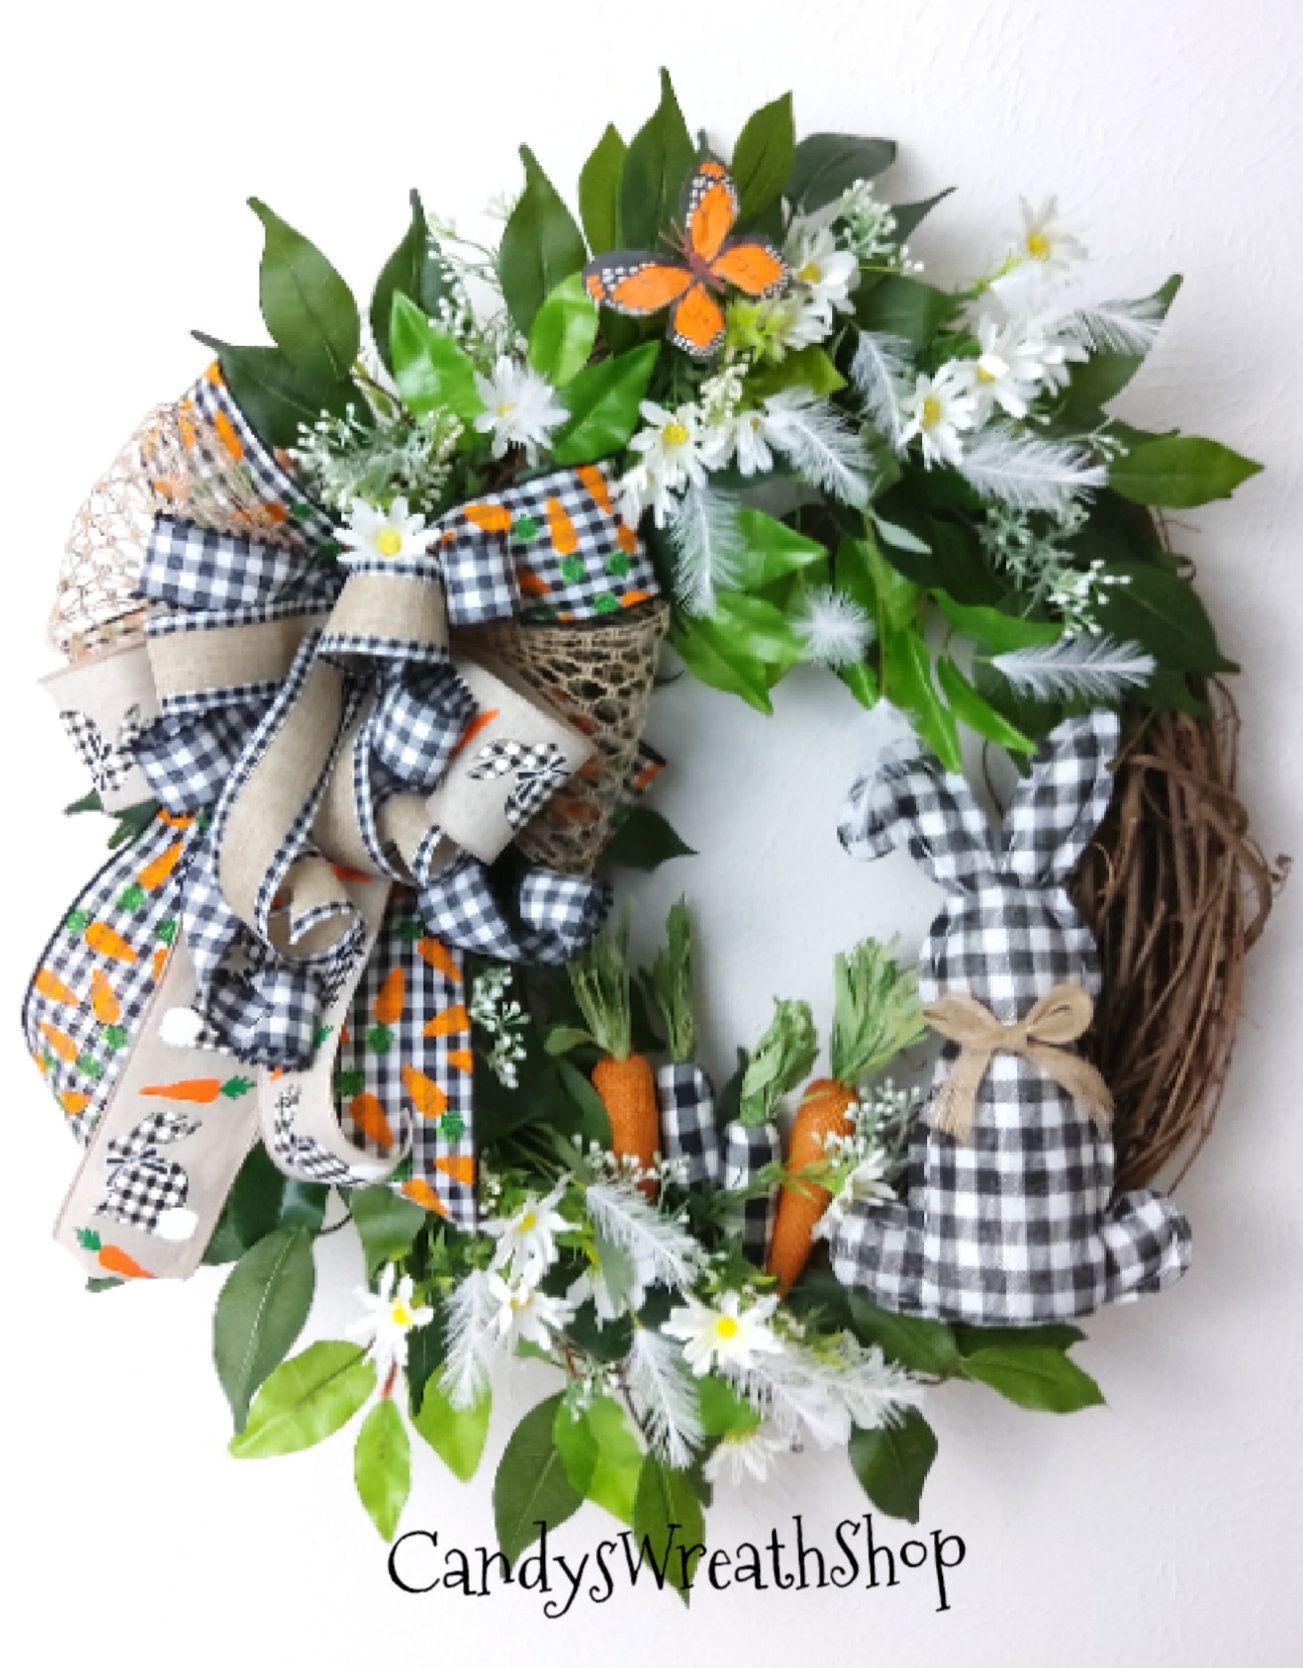 Photo of Easter Wreath, Spring Wreath, Easter Grapevine, Bunny Wreath, Spring Floral, Farmhouse Wreath, Welcome Wreath, Buffalo Plaid, Rabbit Wreath